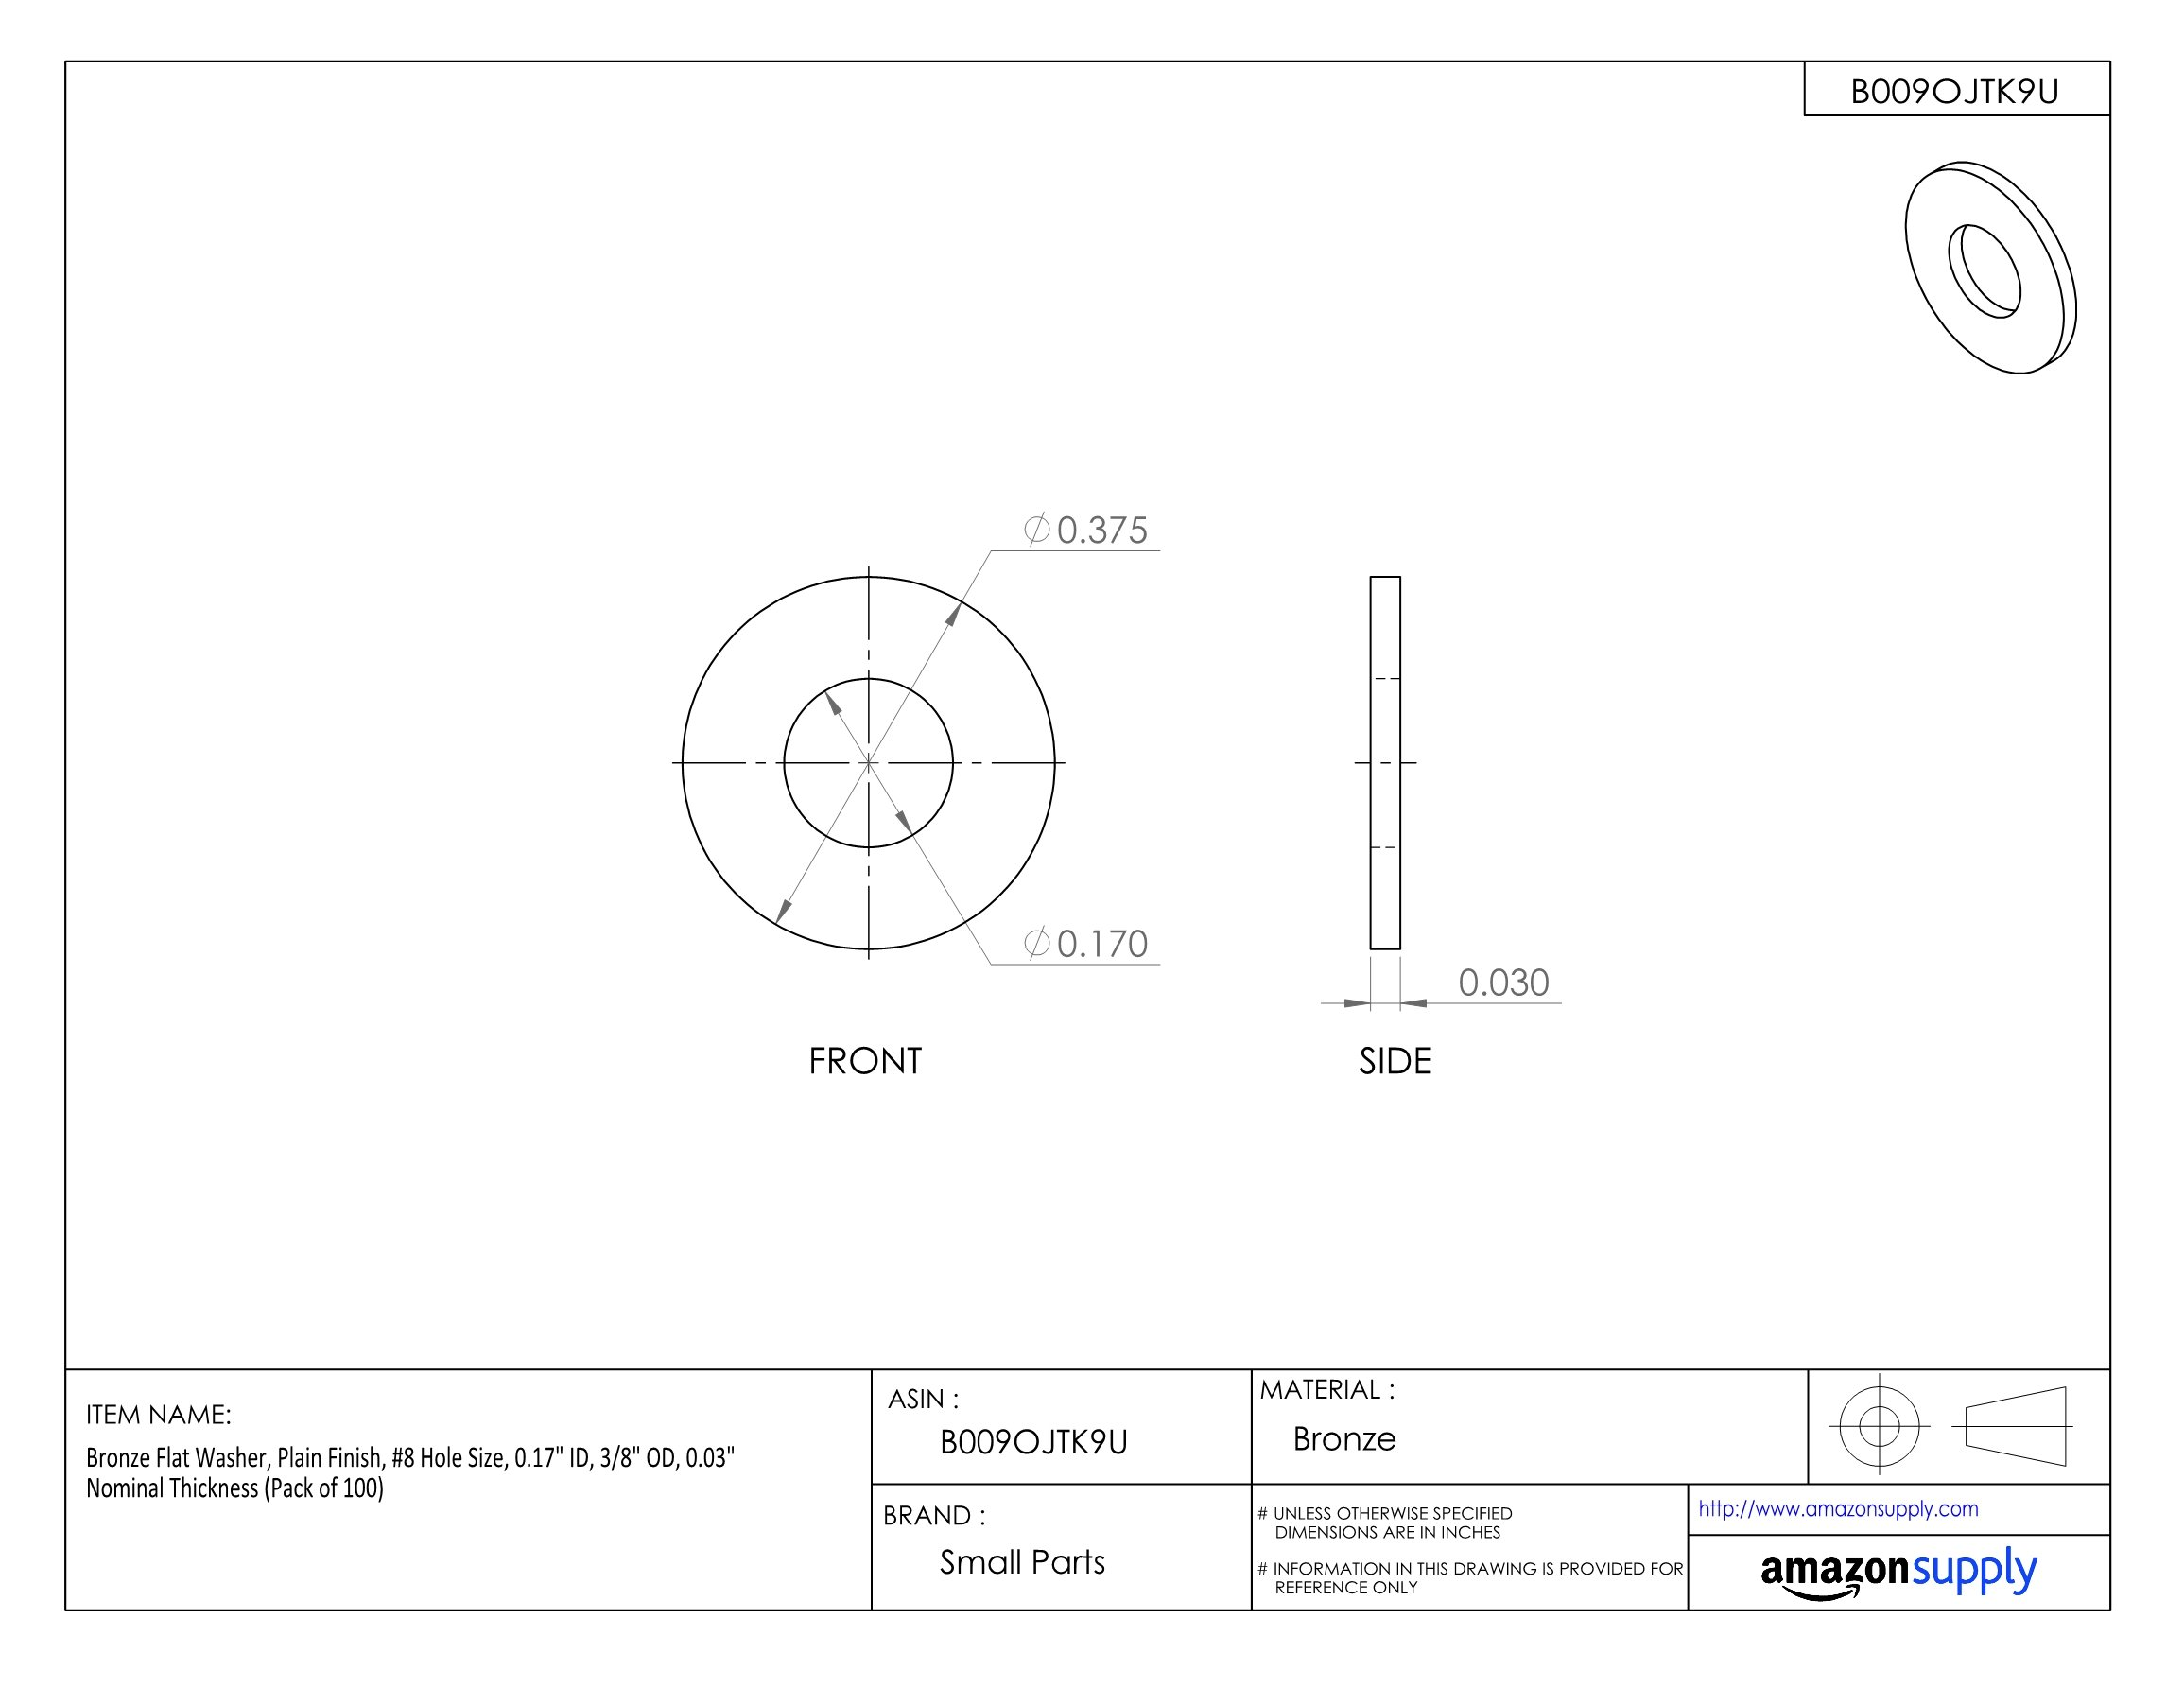 Bronze Flat Washer, Plain Finish, #8 Hole Size, 0.17'' ID, 3/8'' OD, 0.03'' Nominal Thickness (Pack of 100)